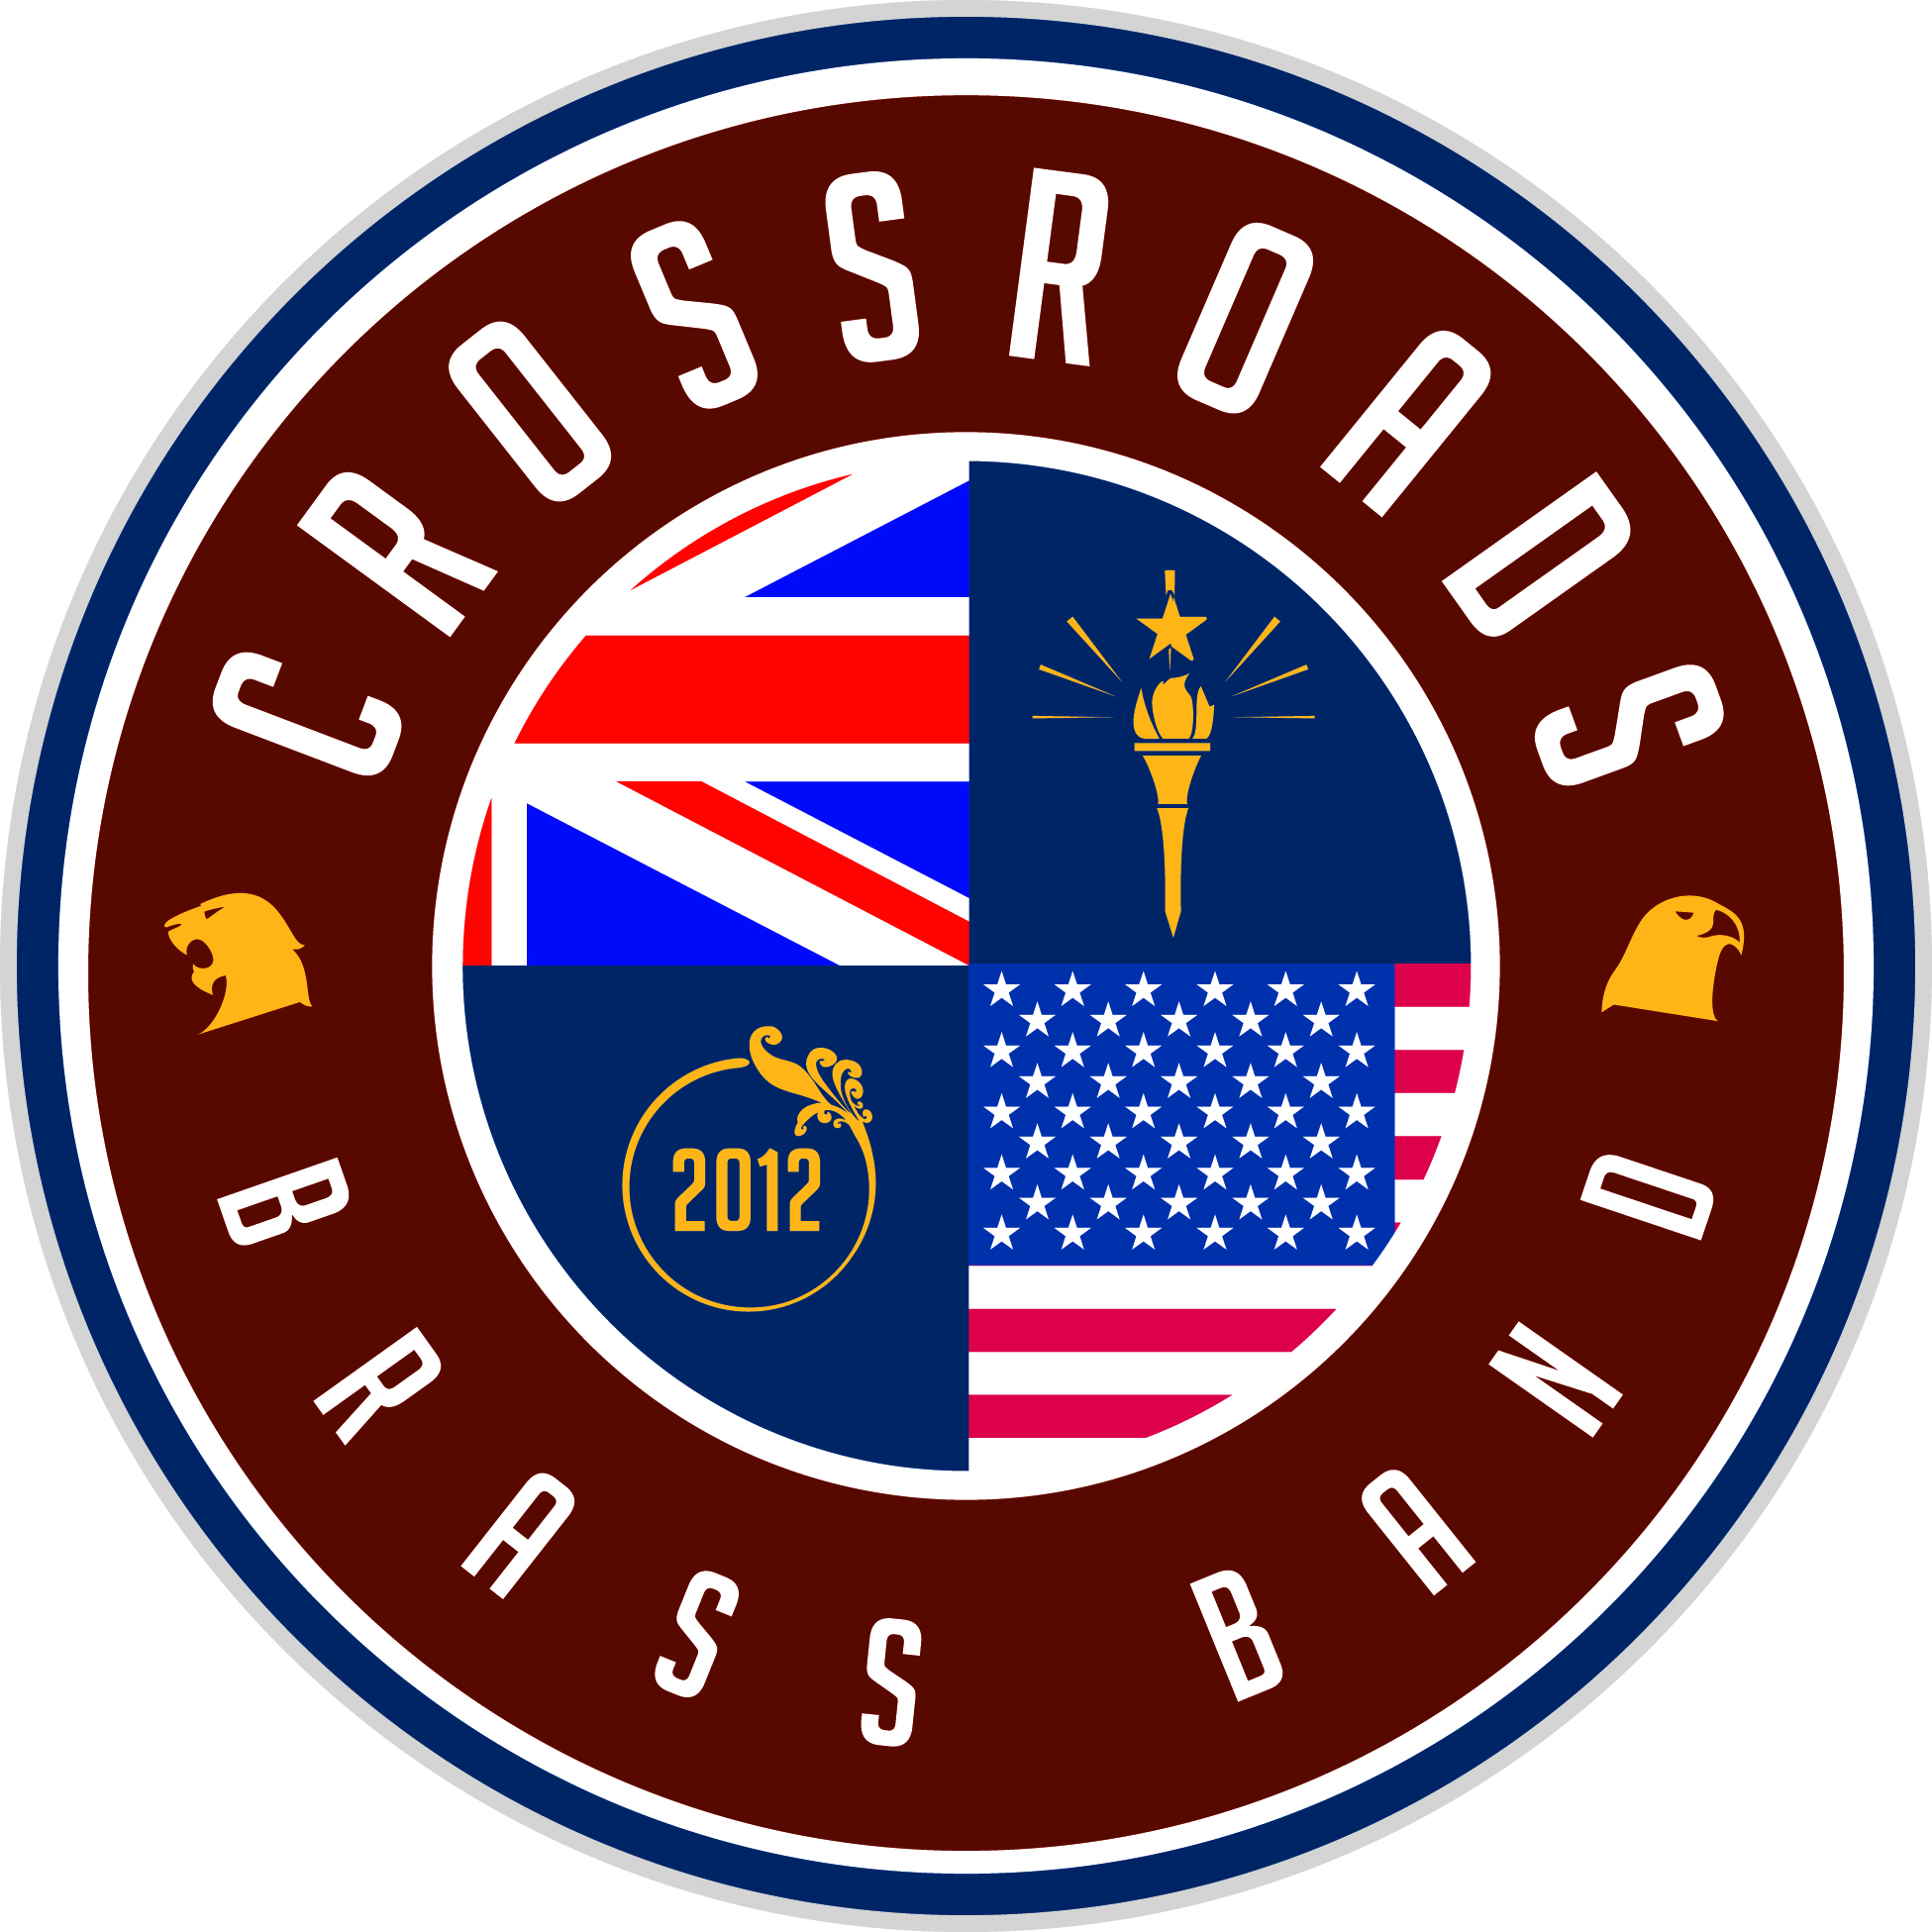 Crossroads Logo 2012.jpg